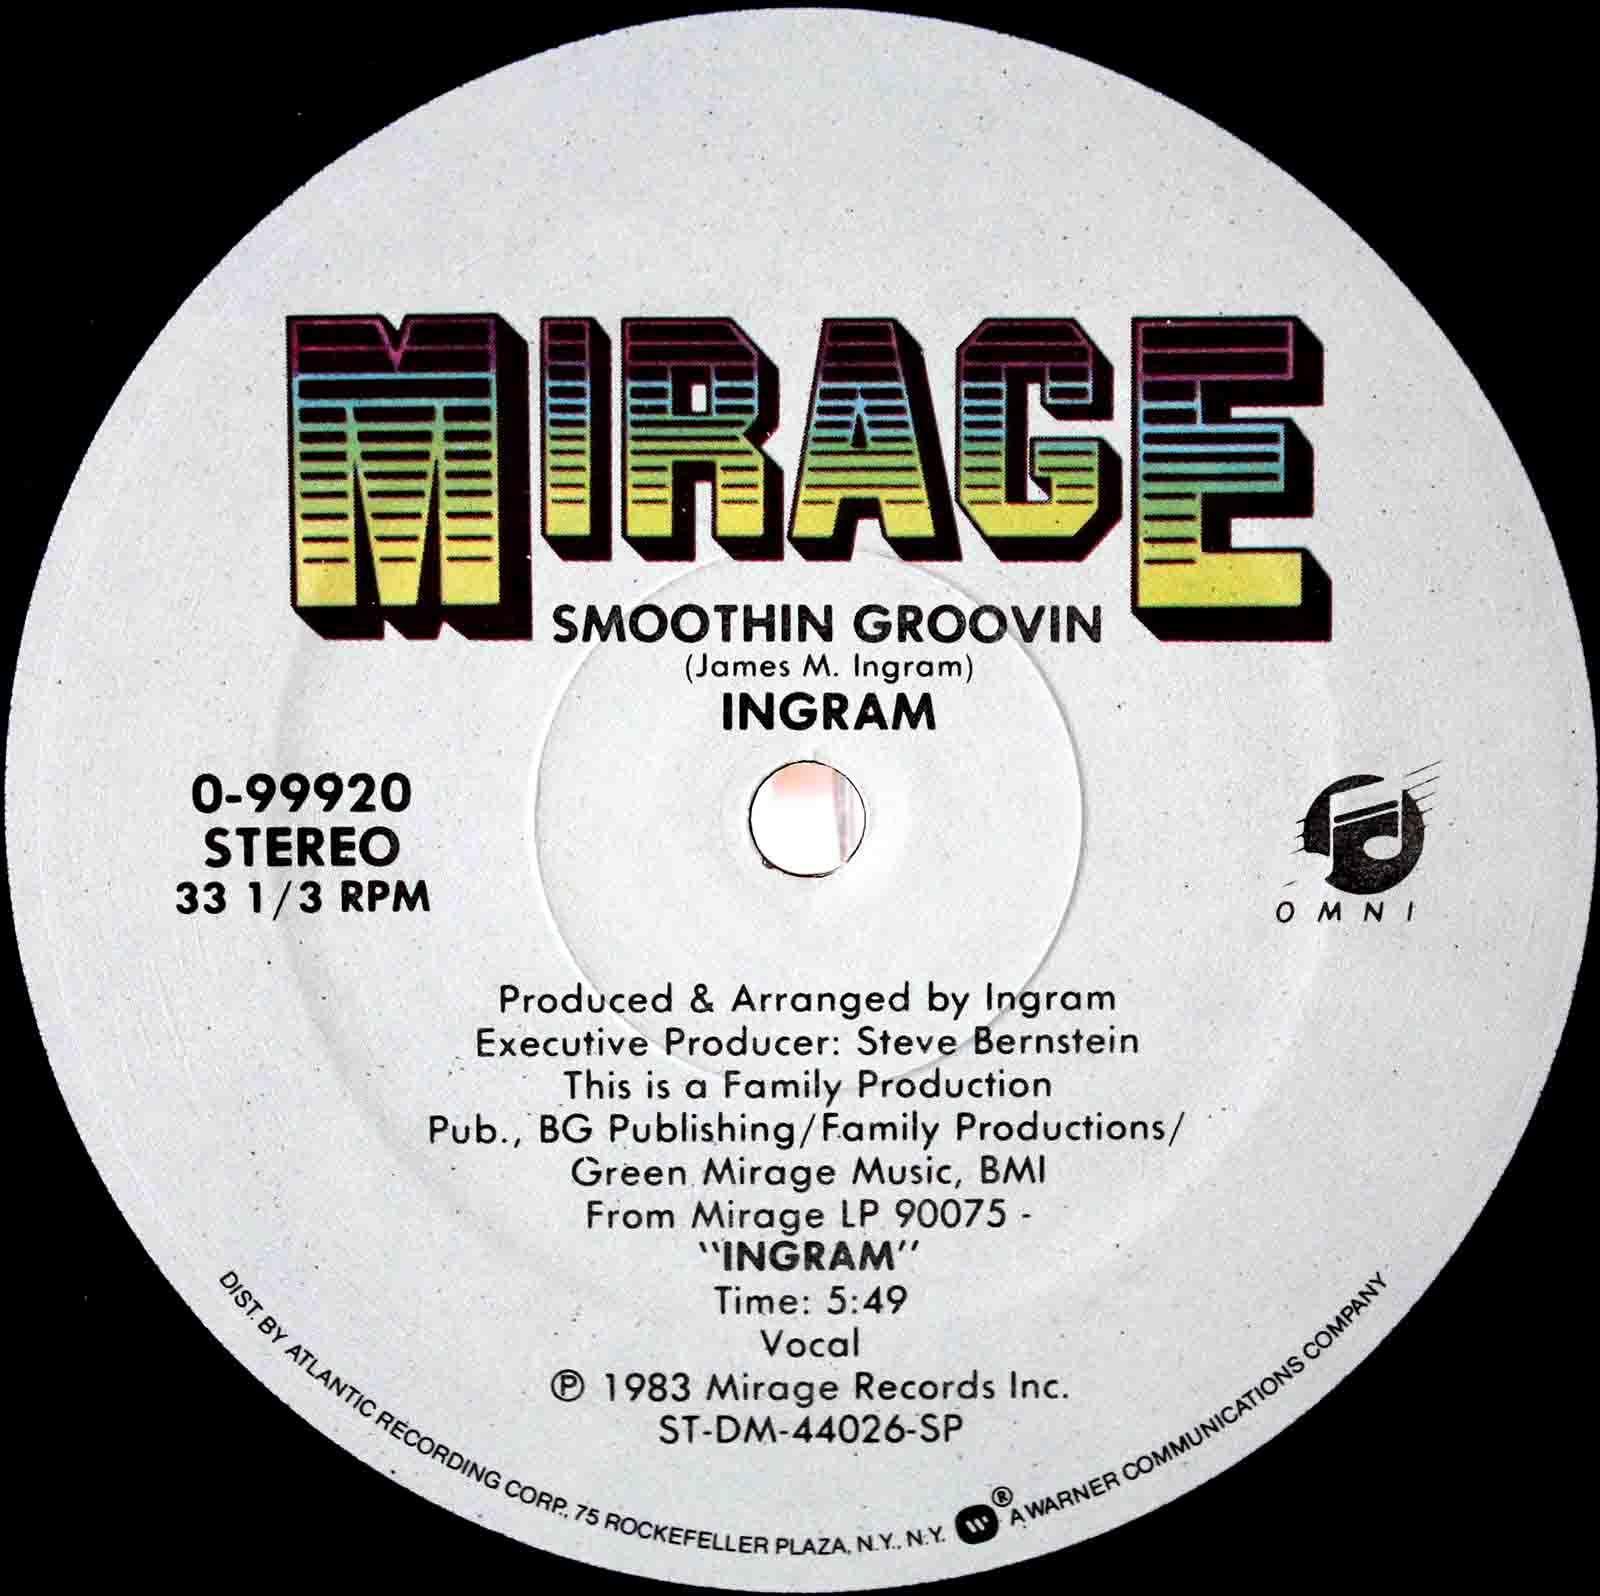 Ingram – Smoothin Groovin 02